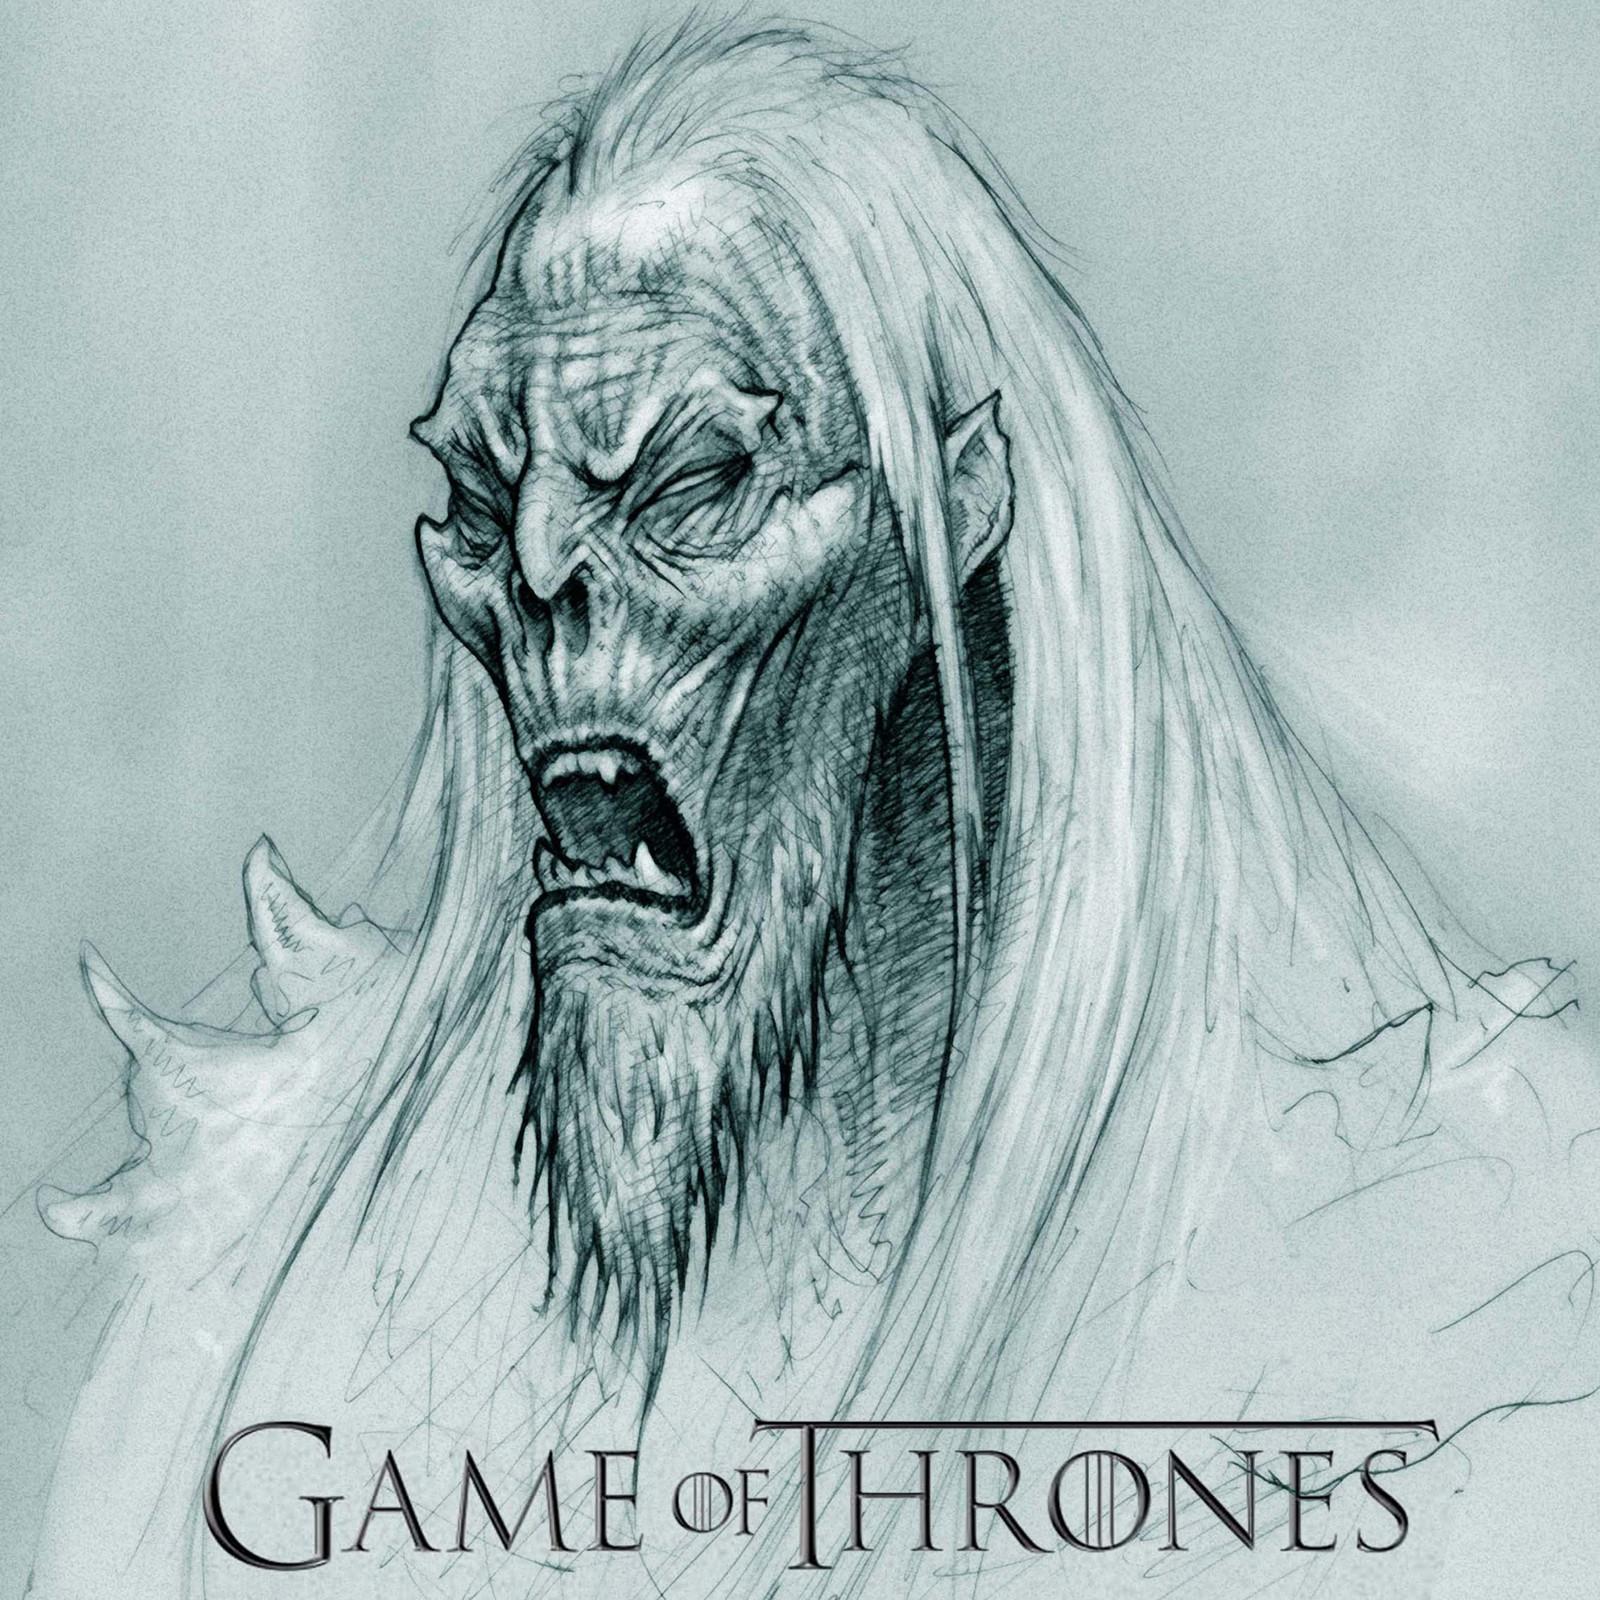 Game of Thrones - Season 1 - White Walkers